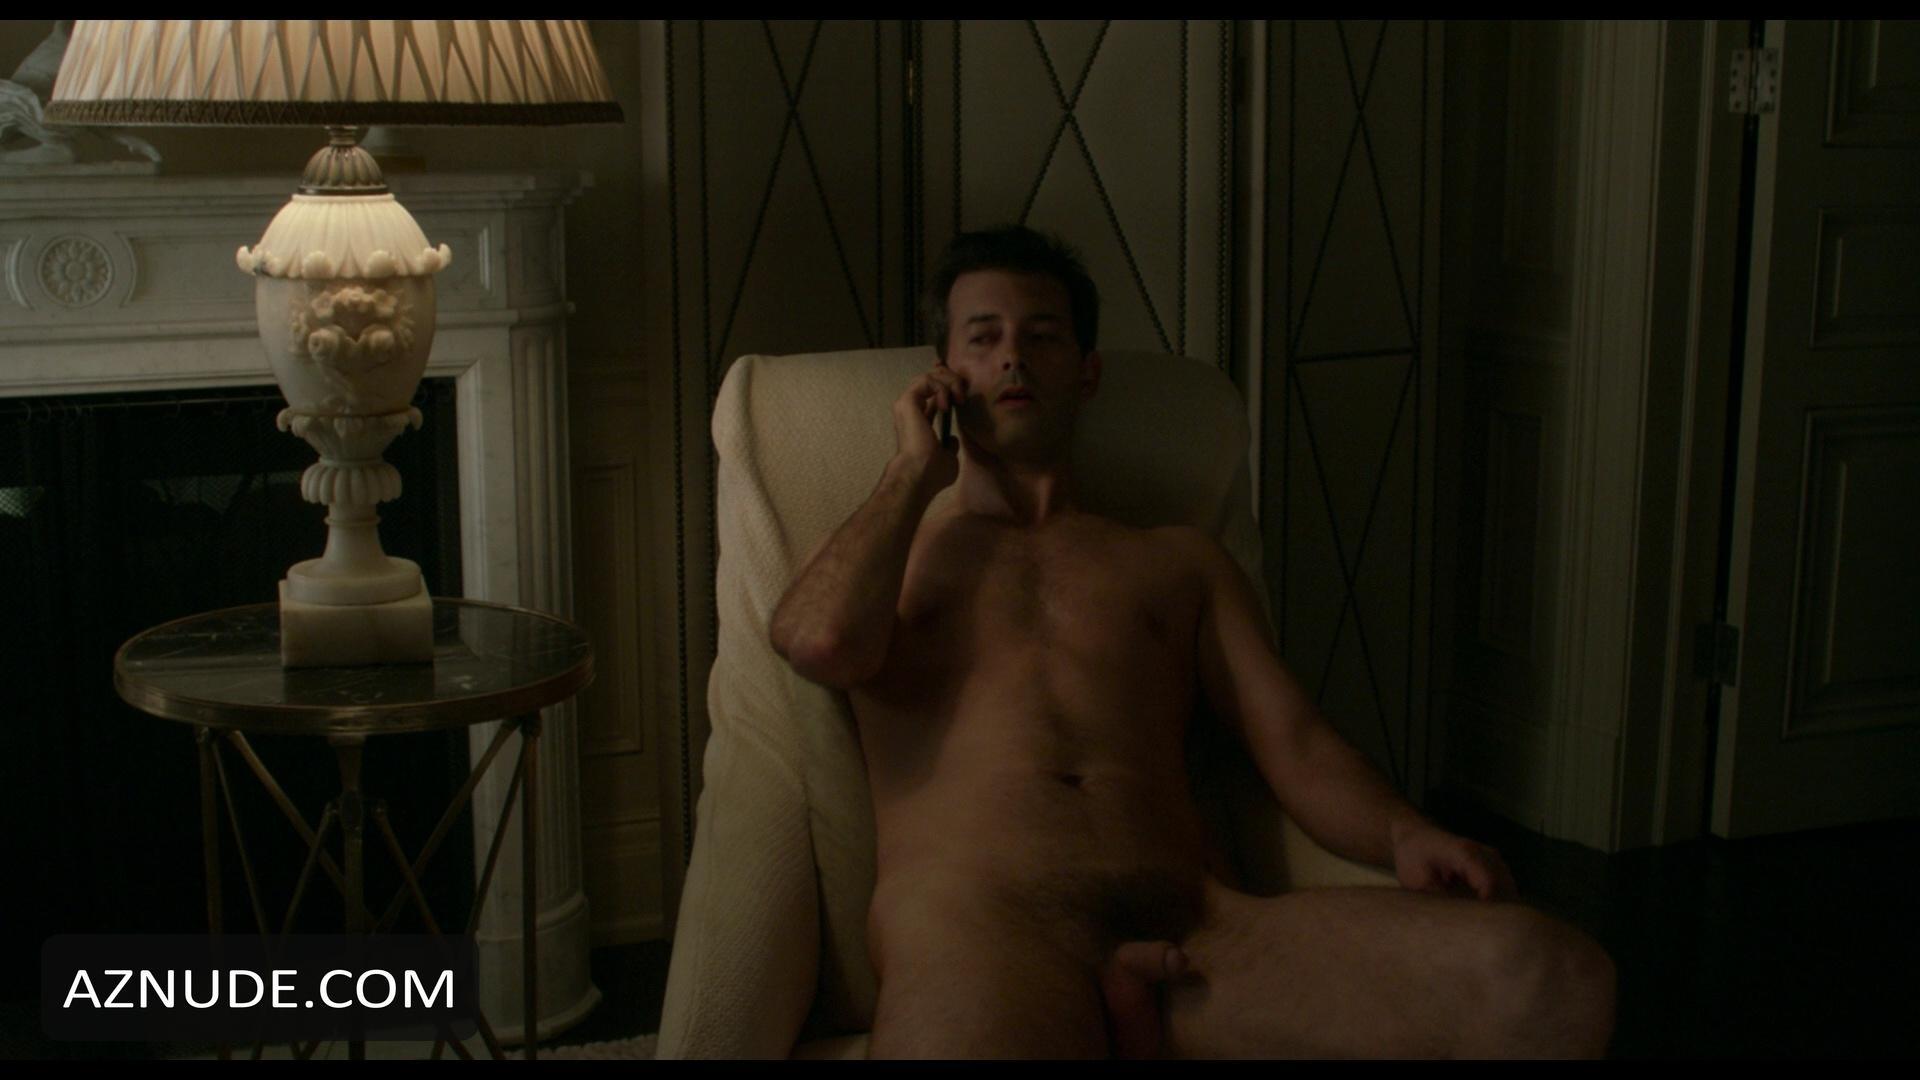 Jonathan Watton Nude - Aznude Men